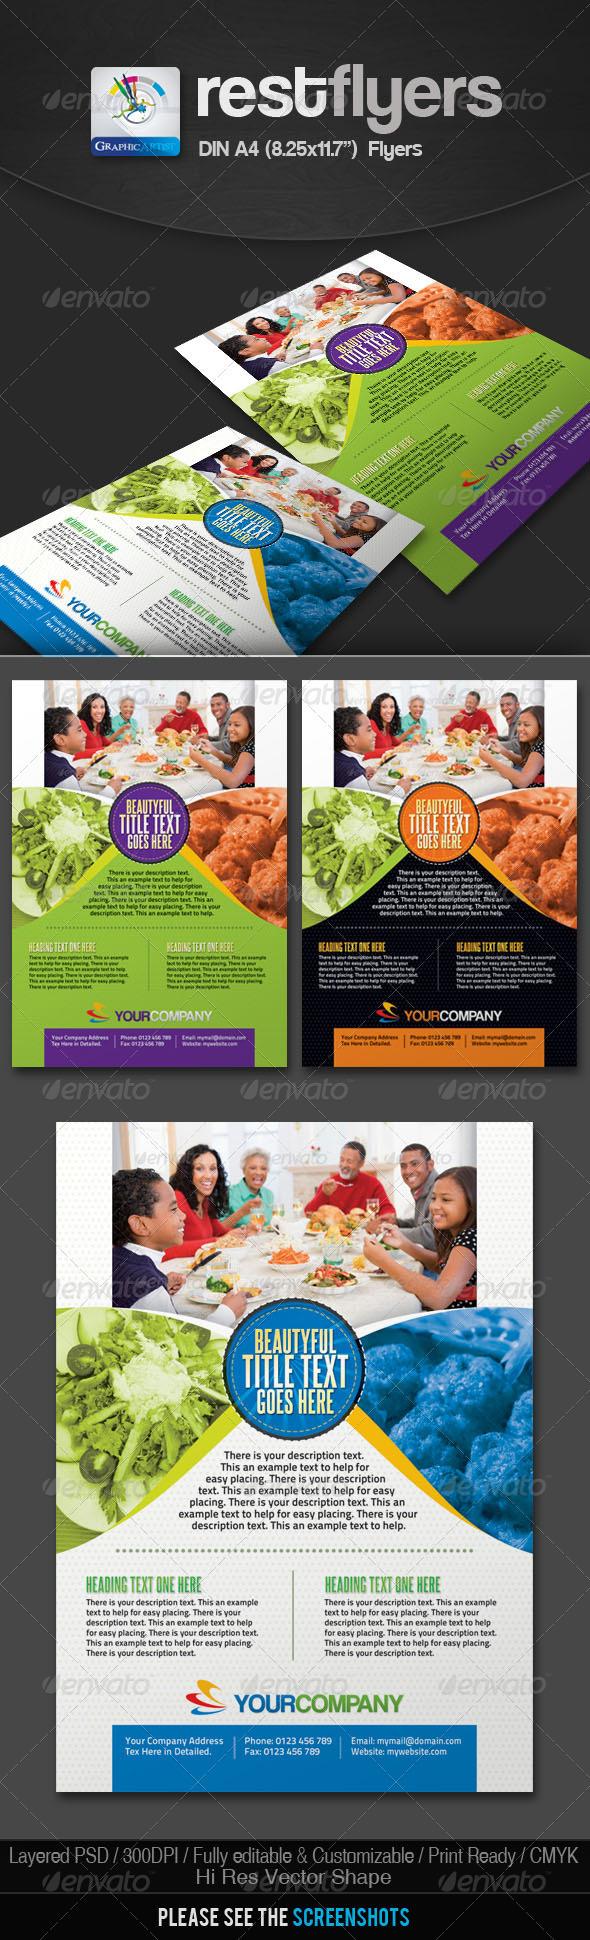 Rest Restaurant Foods Flyers - Restaurant Flyers